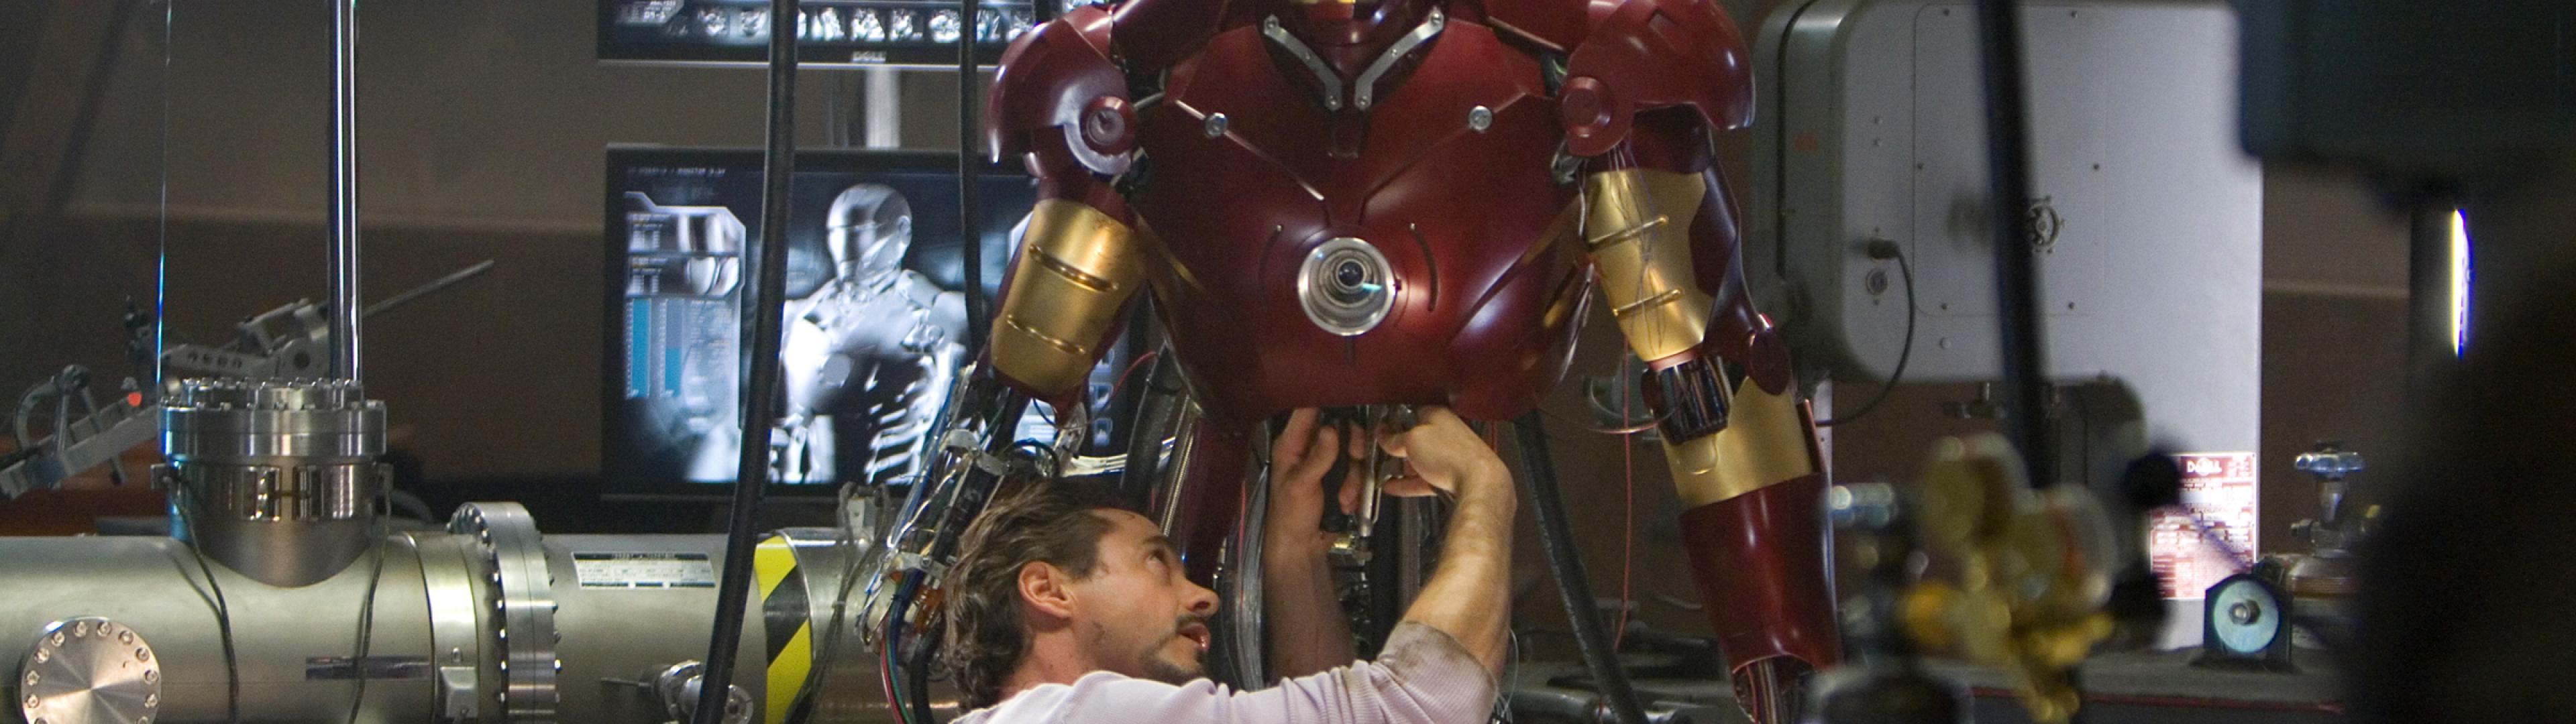 iron man epic hero movies Ultra or Dual High Definition 2560x1440 3840x1080